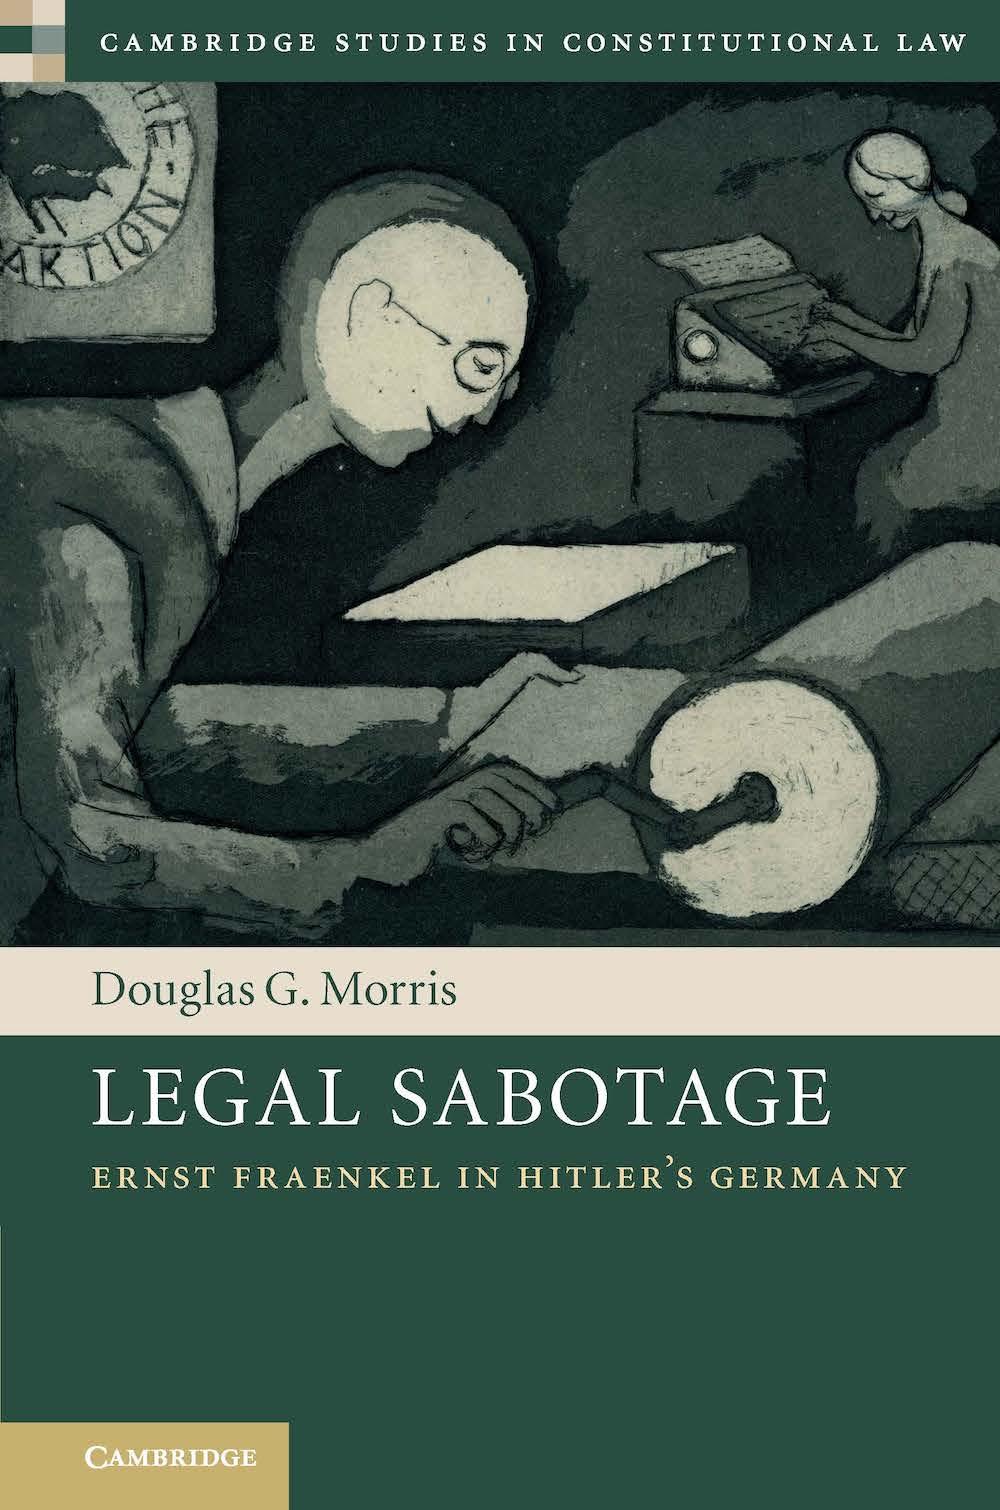 Legal Sabotage cover